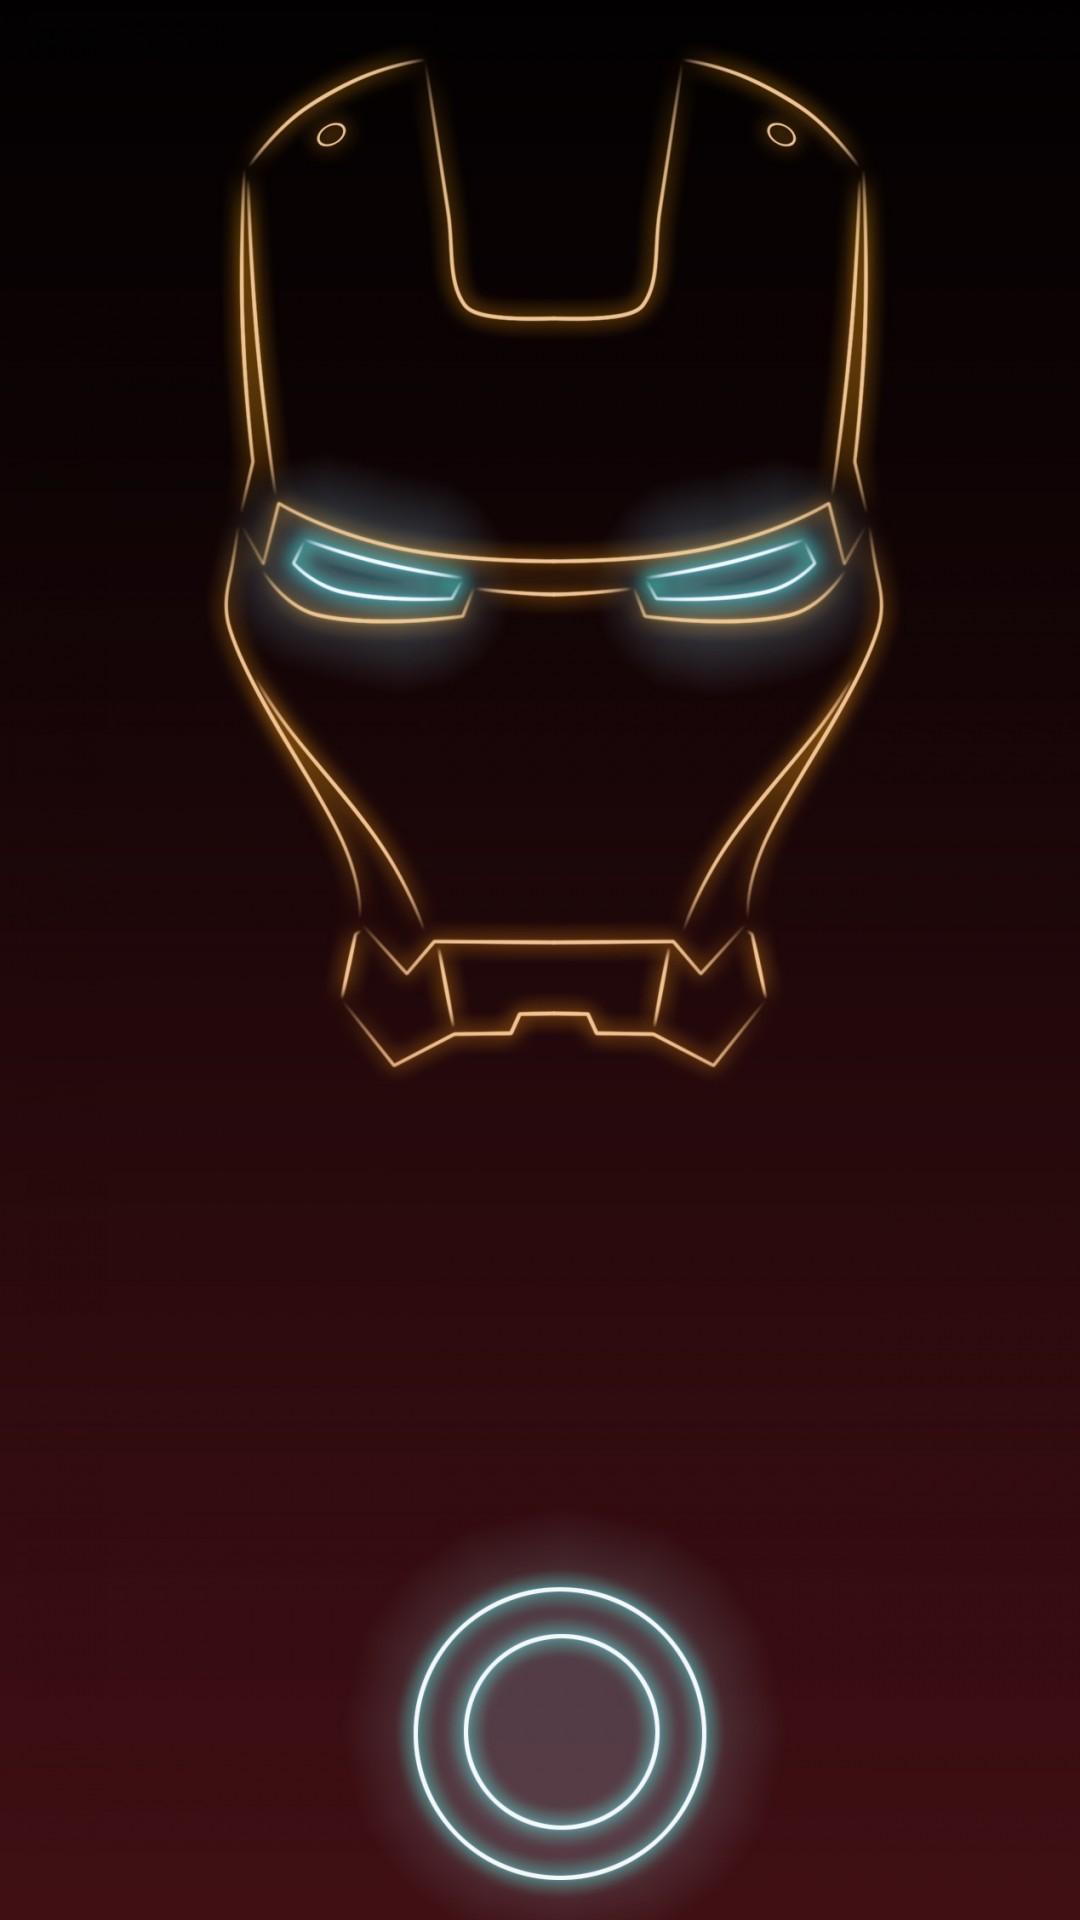 Iron Man HD Wallpapers Backgrounds Wallpaper   HD Wallpapers   Pinterest   Hd  wallpaper, Wallpaper and Wallpaper backgrounds